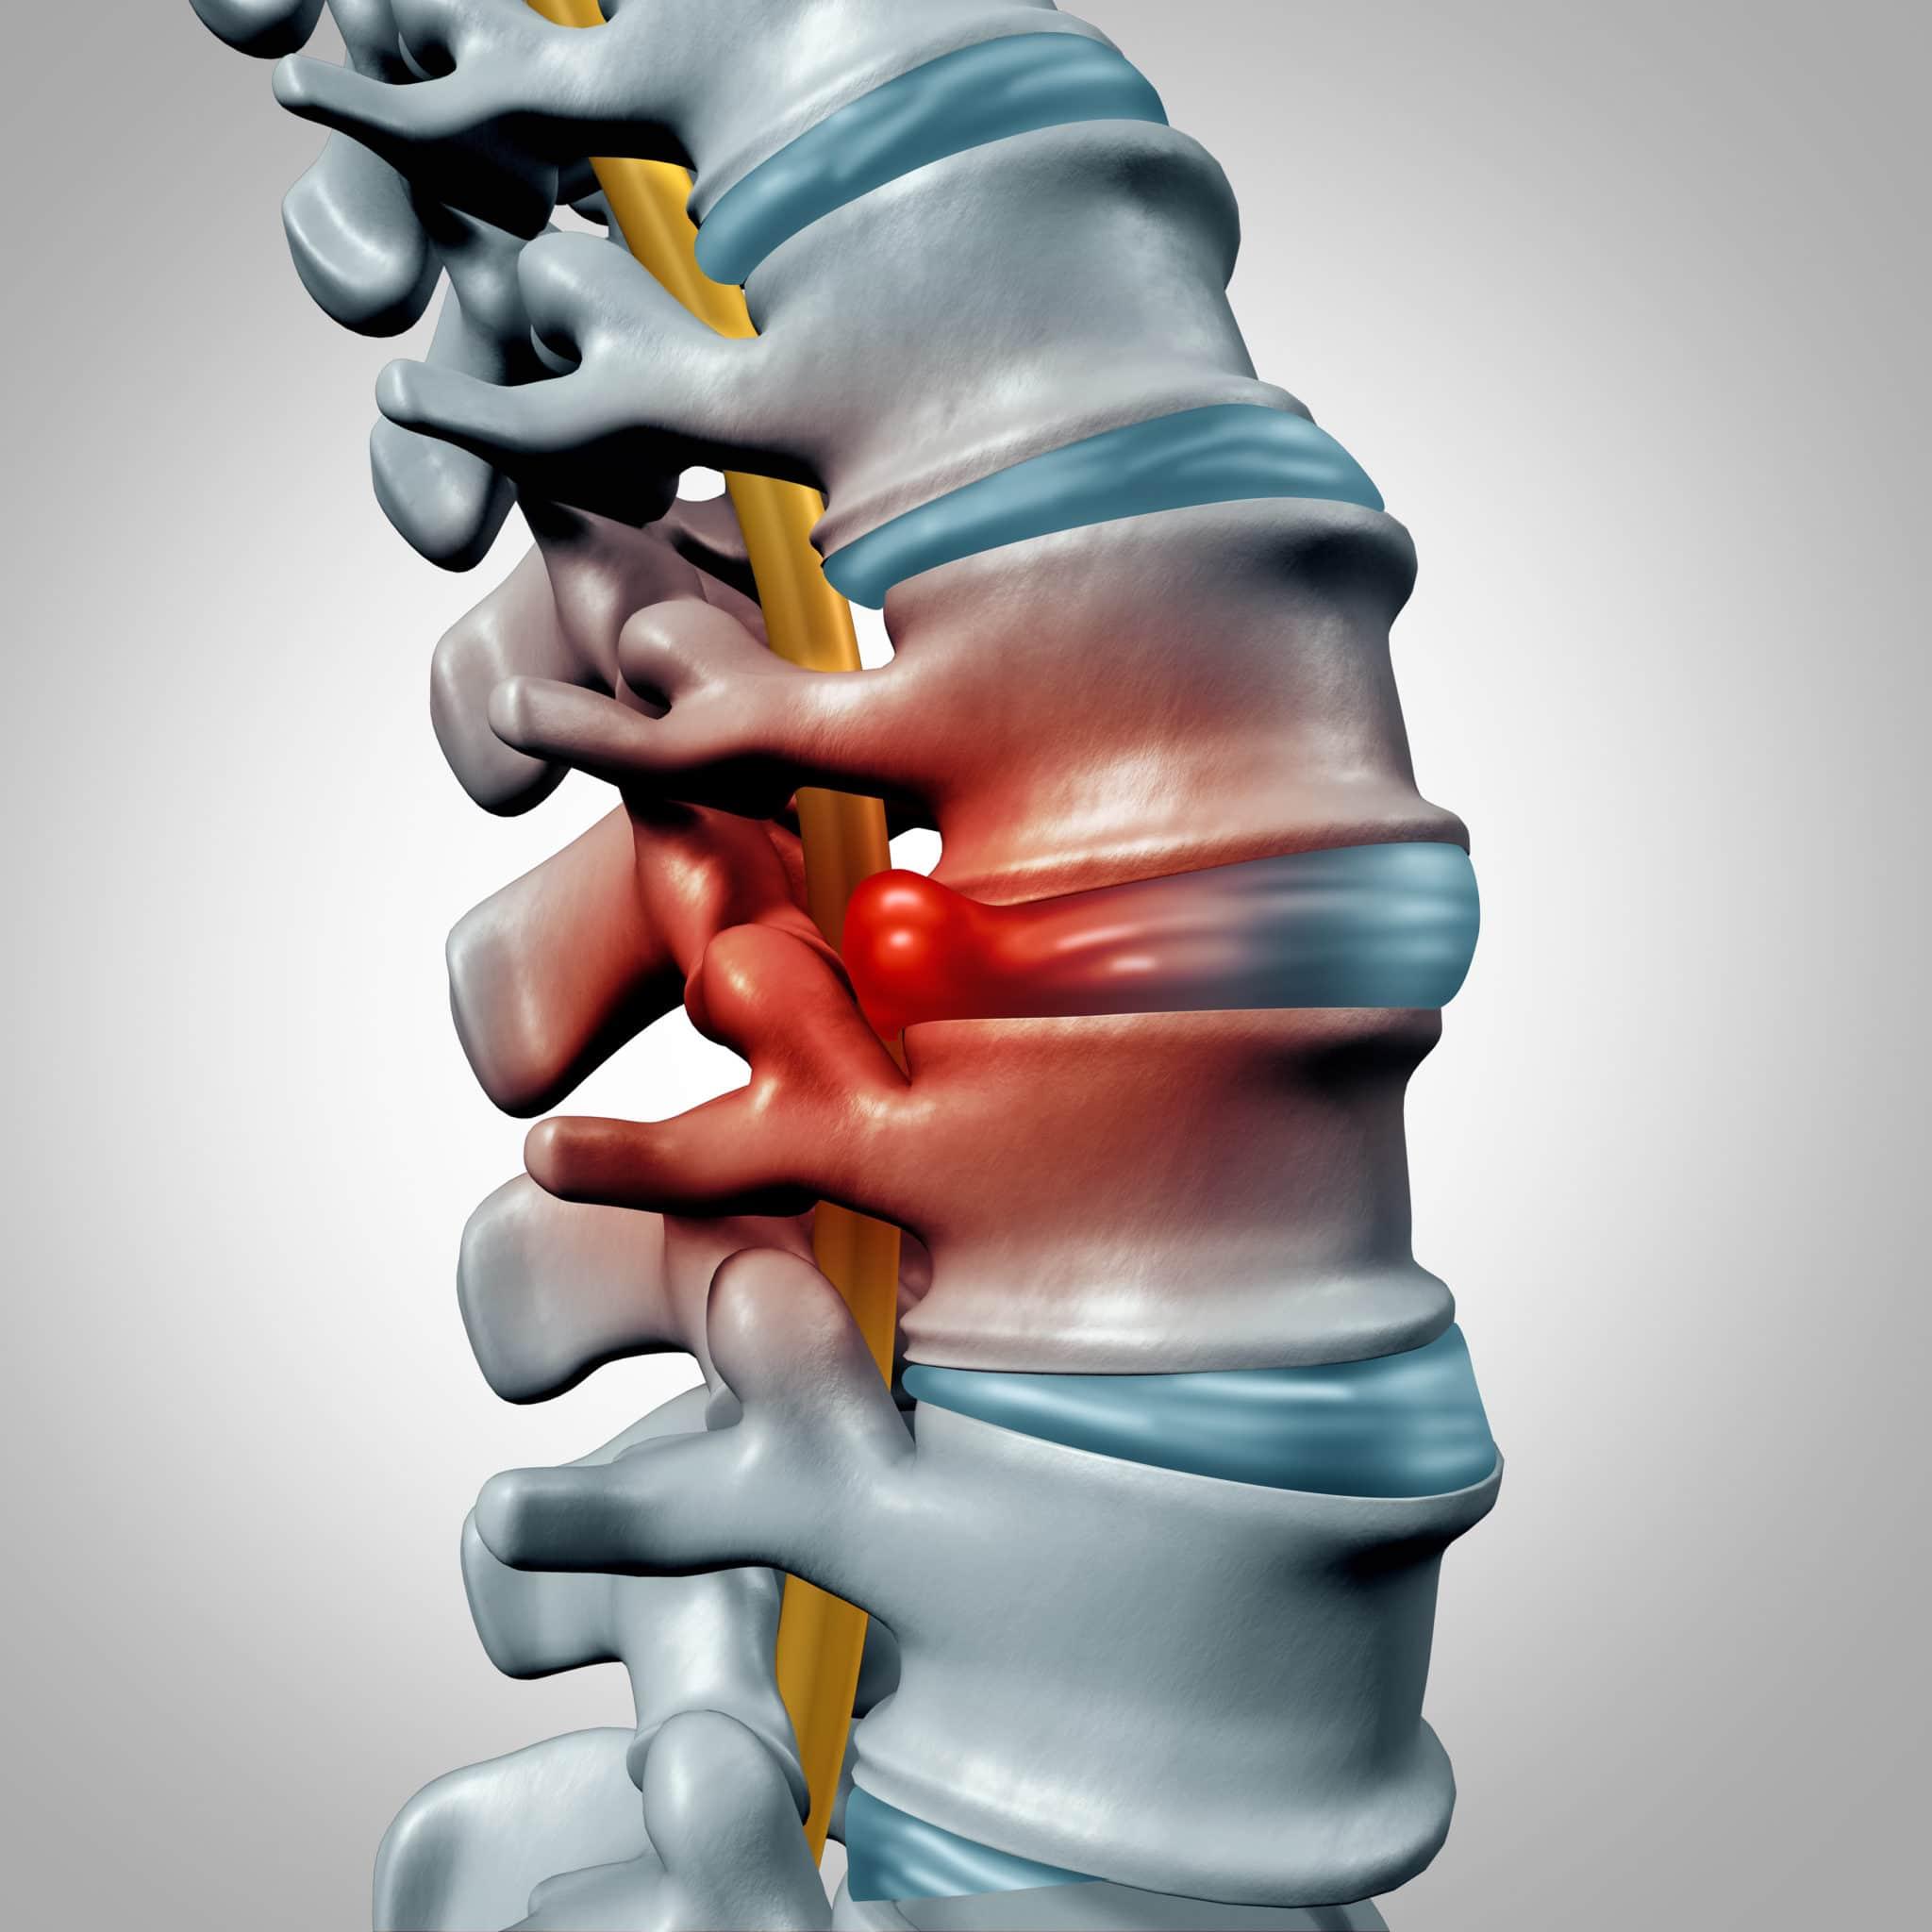 Slipped Disc - Mabuhay Chiropractic Clinics